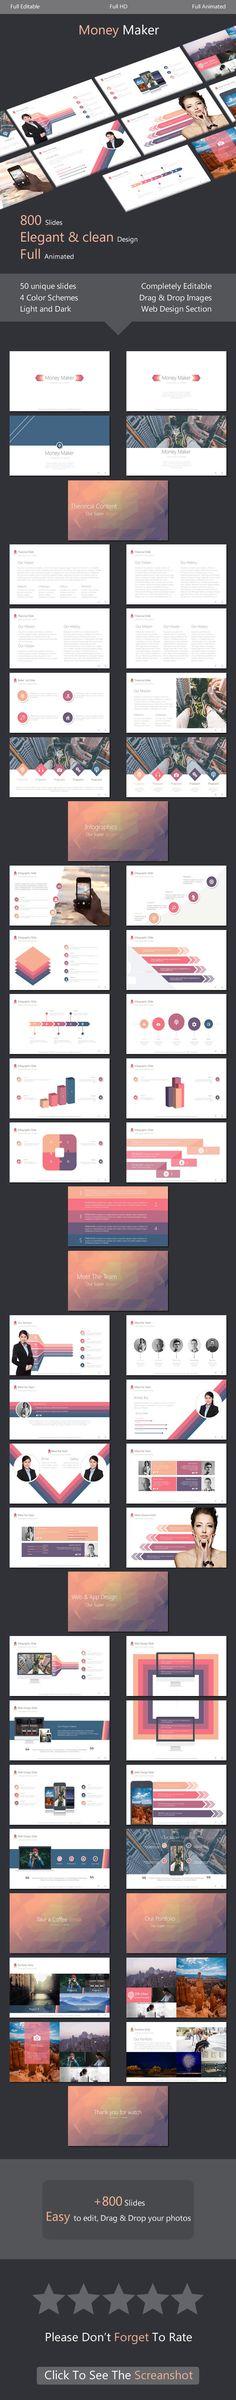 Monos - Minimal Powerpoint Template - elegant powerpoint template